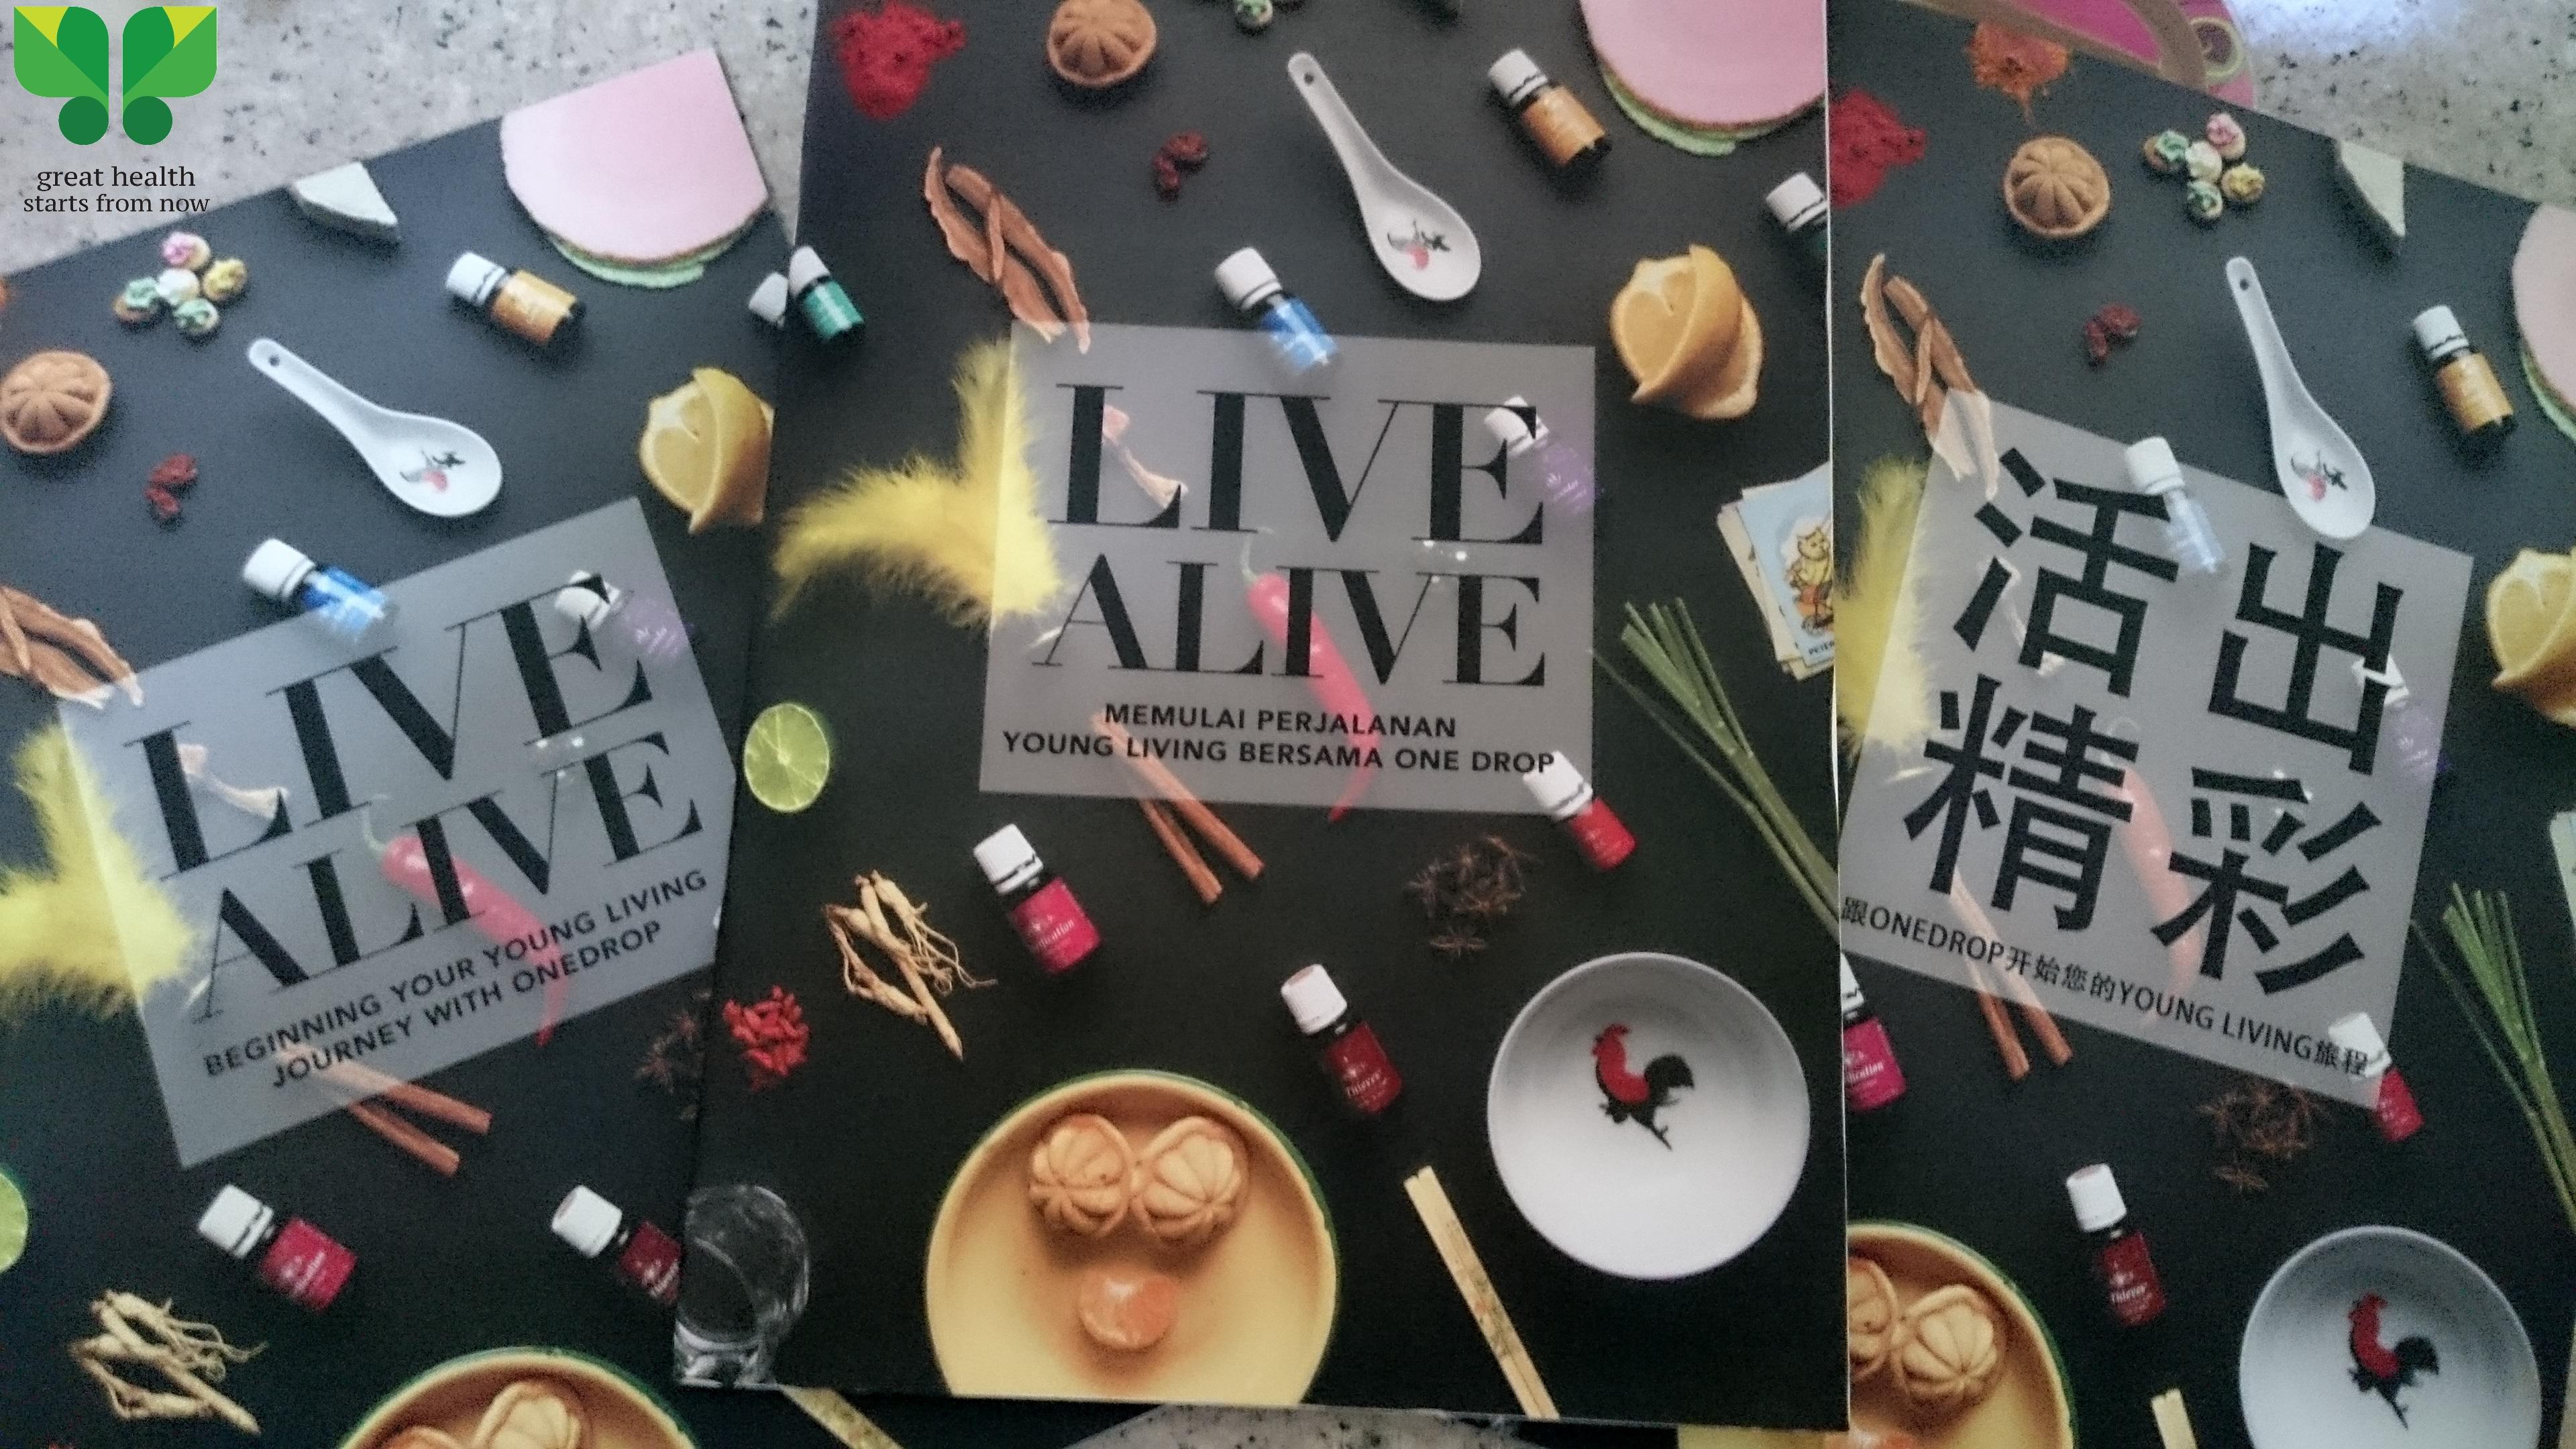 livealive 3 languages.jpg